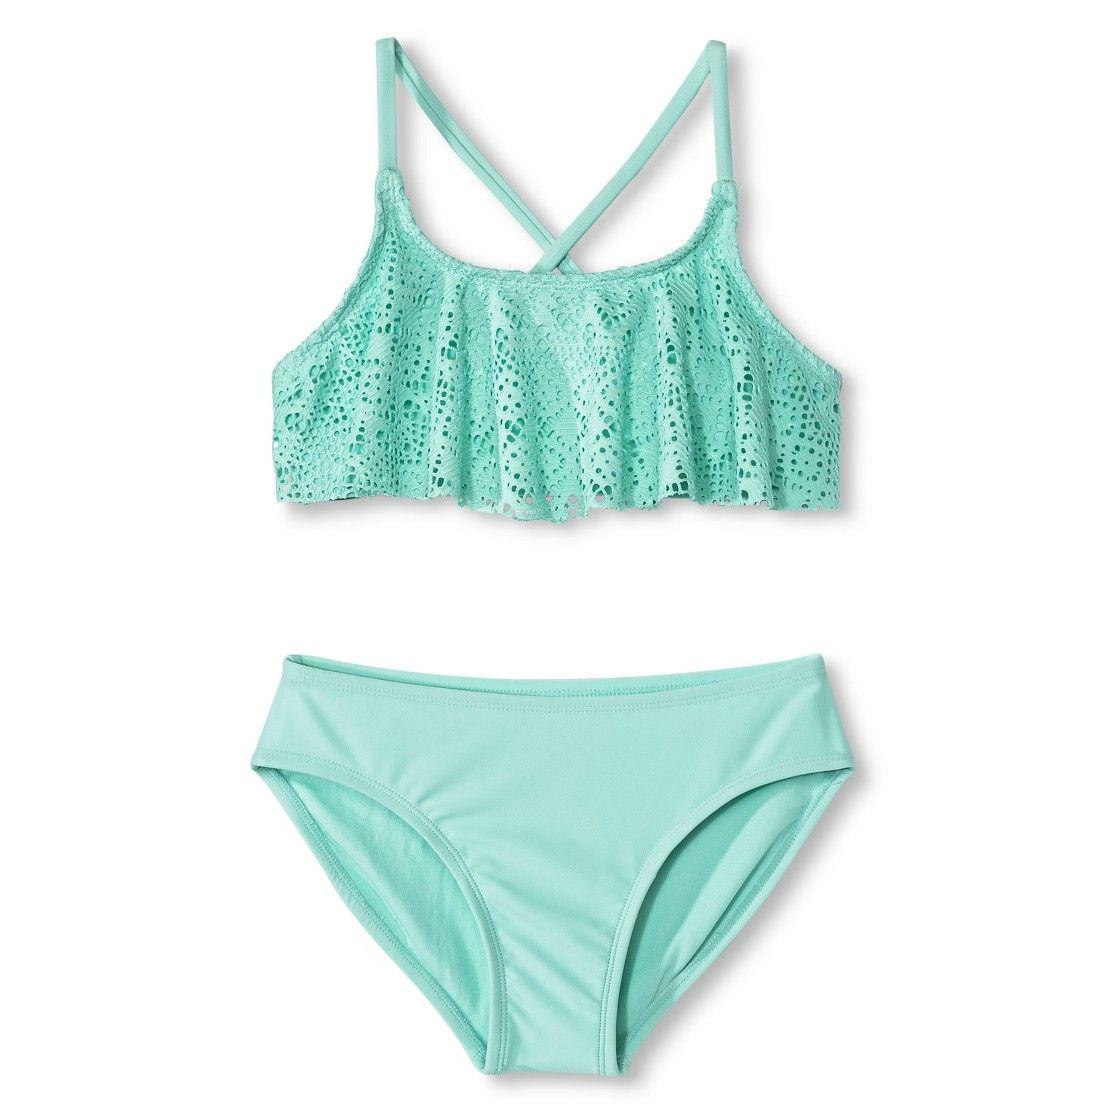 65ba45f32 Girls' 2-Piece Crochet Top Bikini Set | My Kids - Lucibella | Girls ...